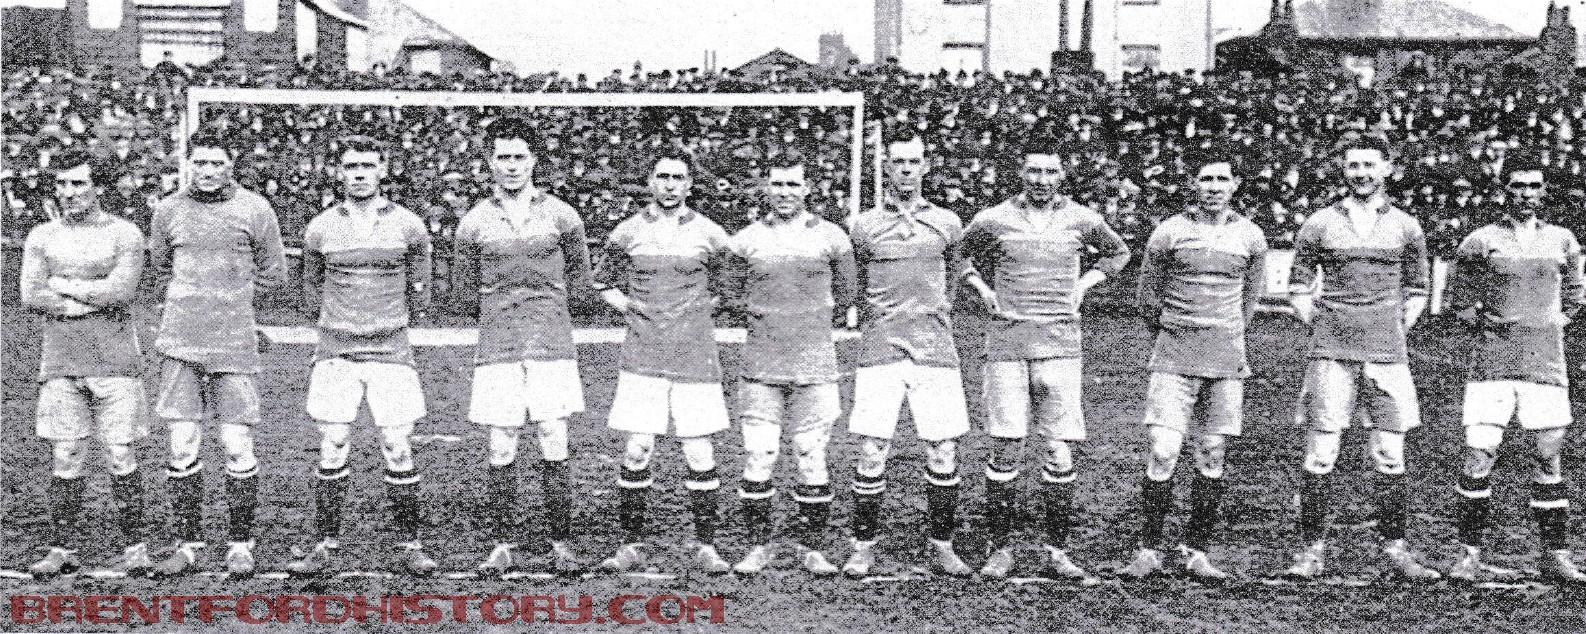 Brentford FC 1919 team